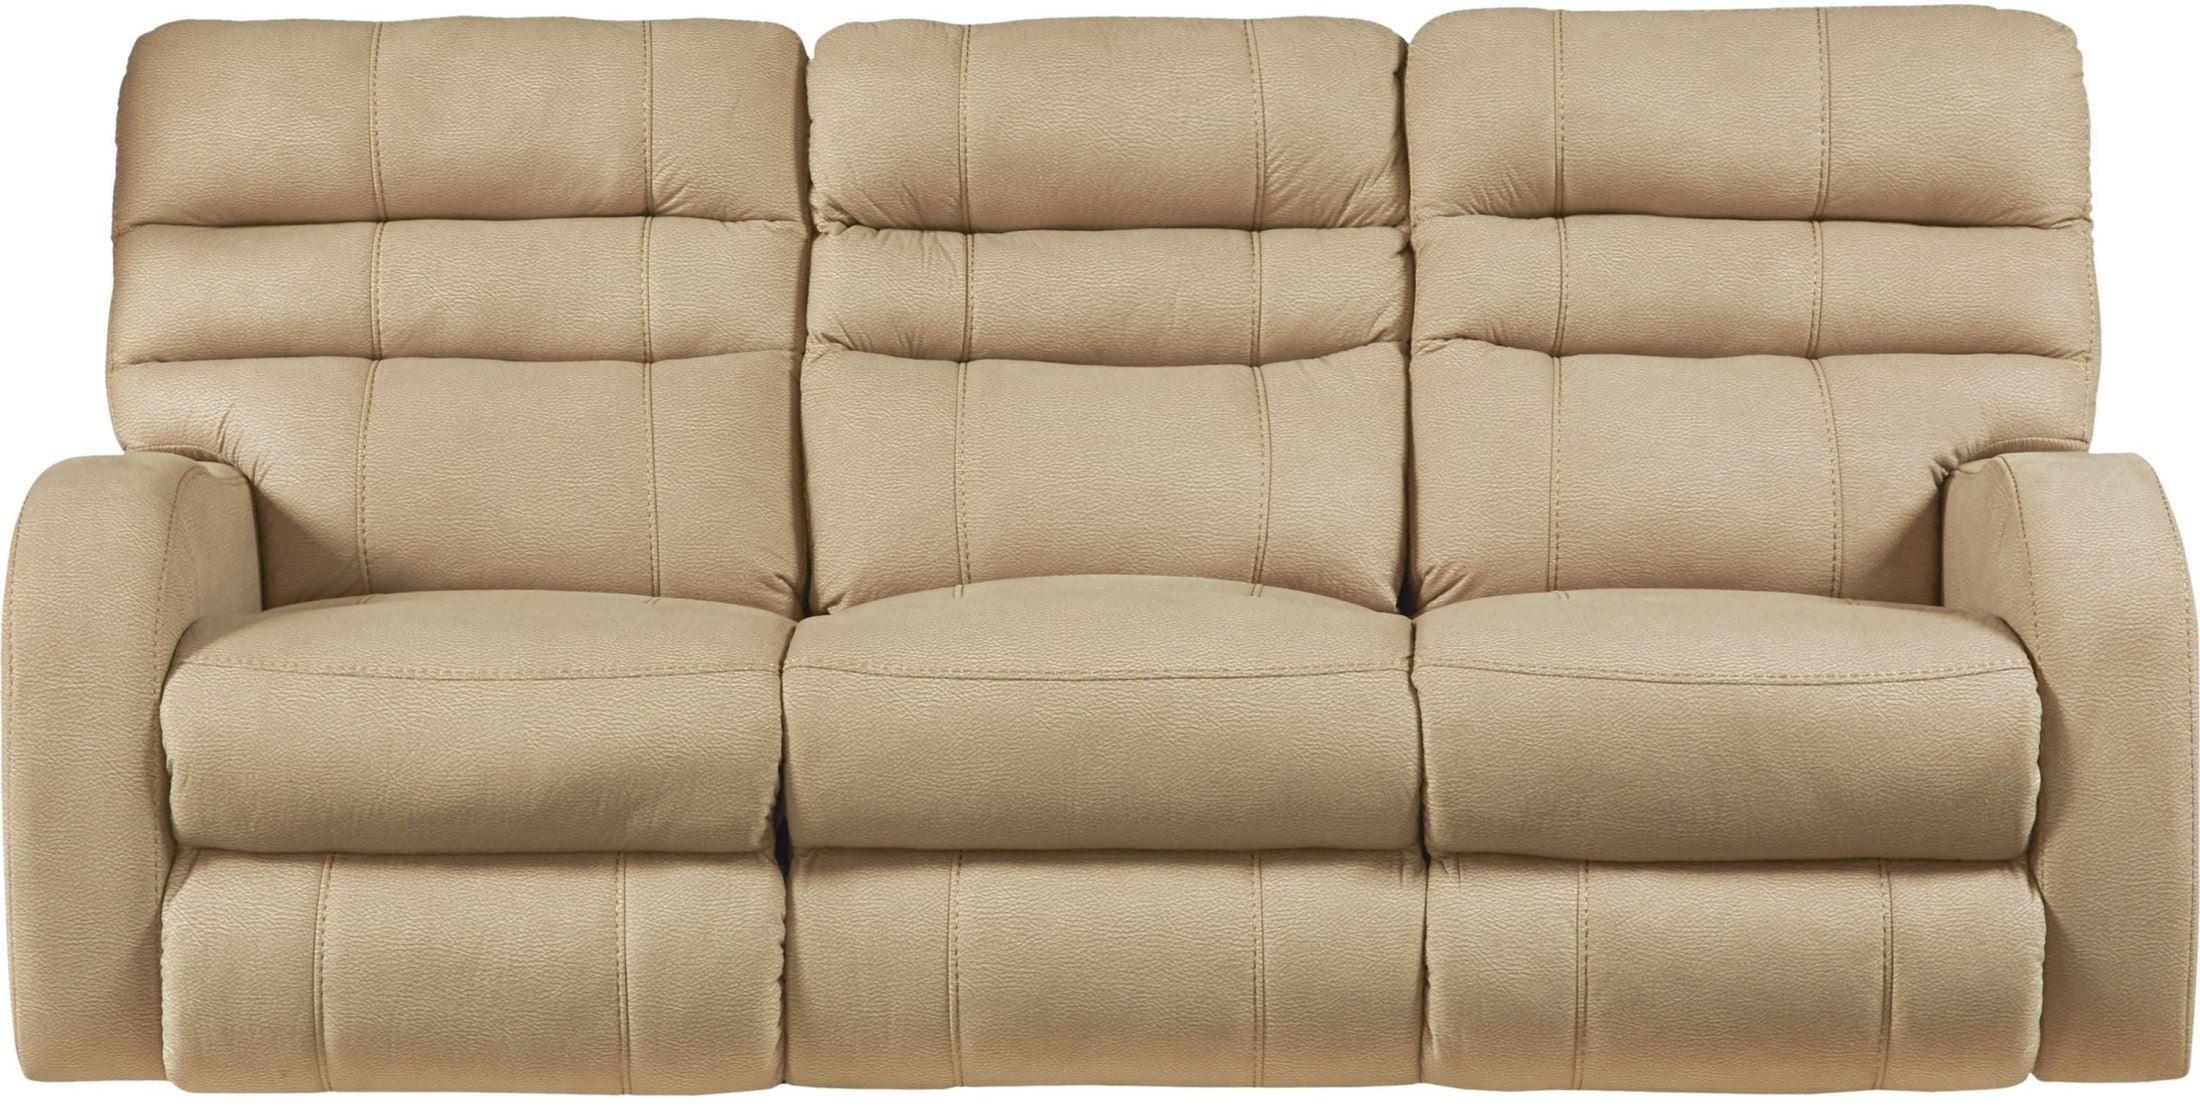 catnapper reclining sofas reviews sofa mart tyler texas portman review home co